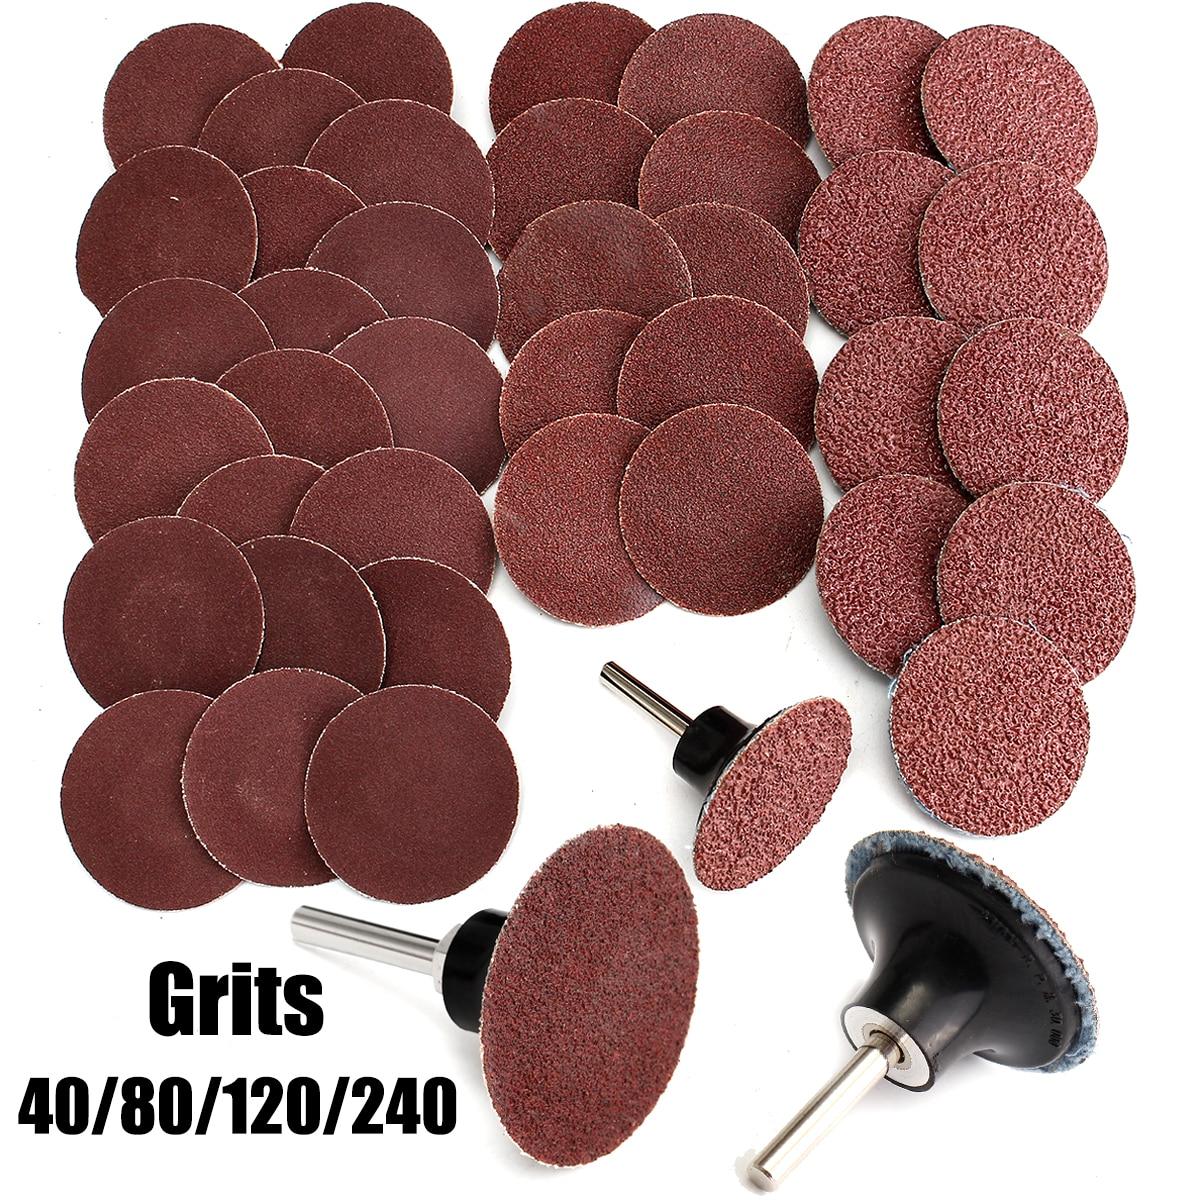 "40+1 Mix 40/80/120/240 Grits 2"" Roloc Type R Sanding Disc Abrasive Mandrel Lock Sanding Disc For General Polishing Sanding Pad"